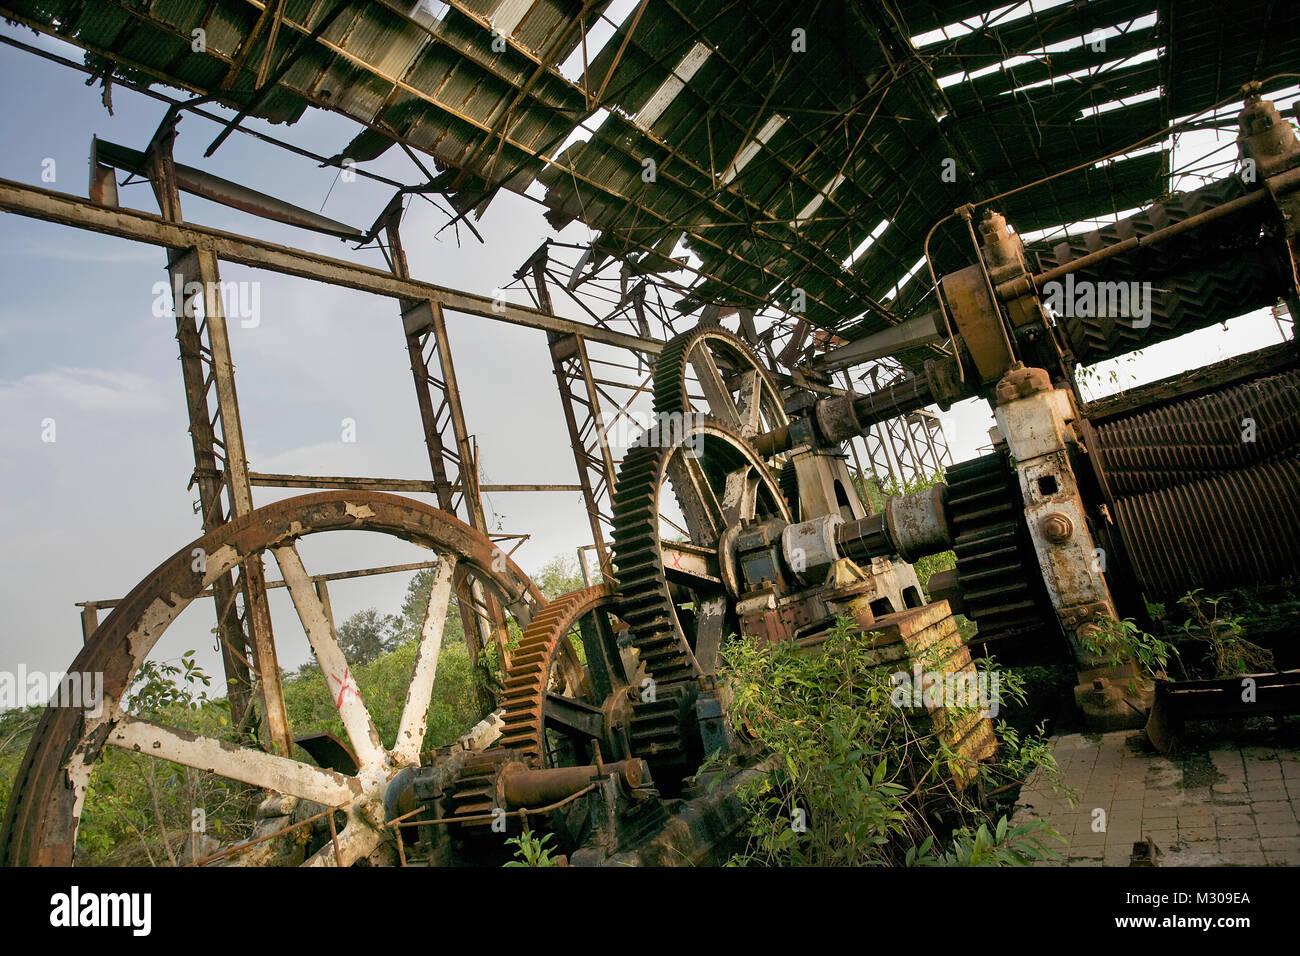 Suriname, Paramaribo. Deserted former sugarcane plantation factory called Marienburg. - Stock Image